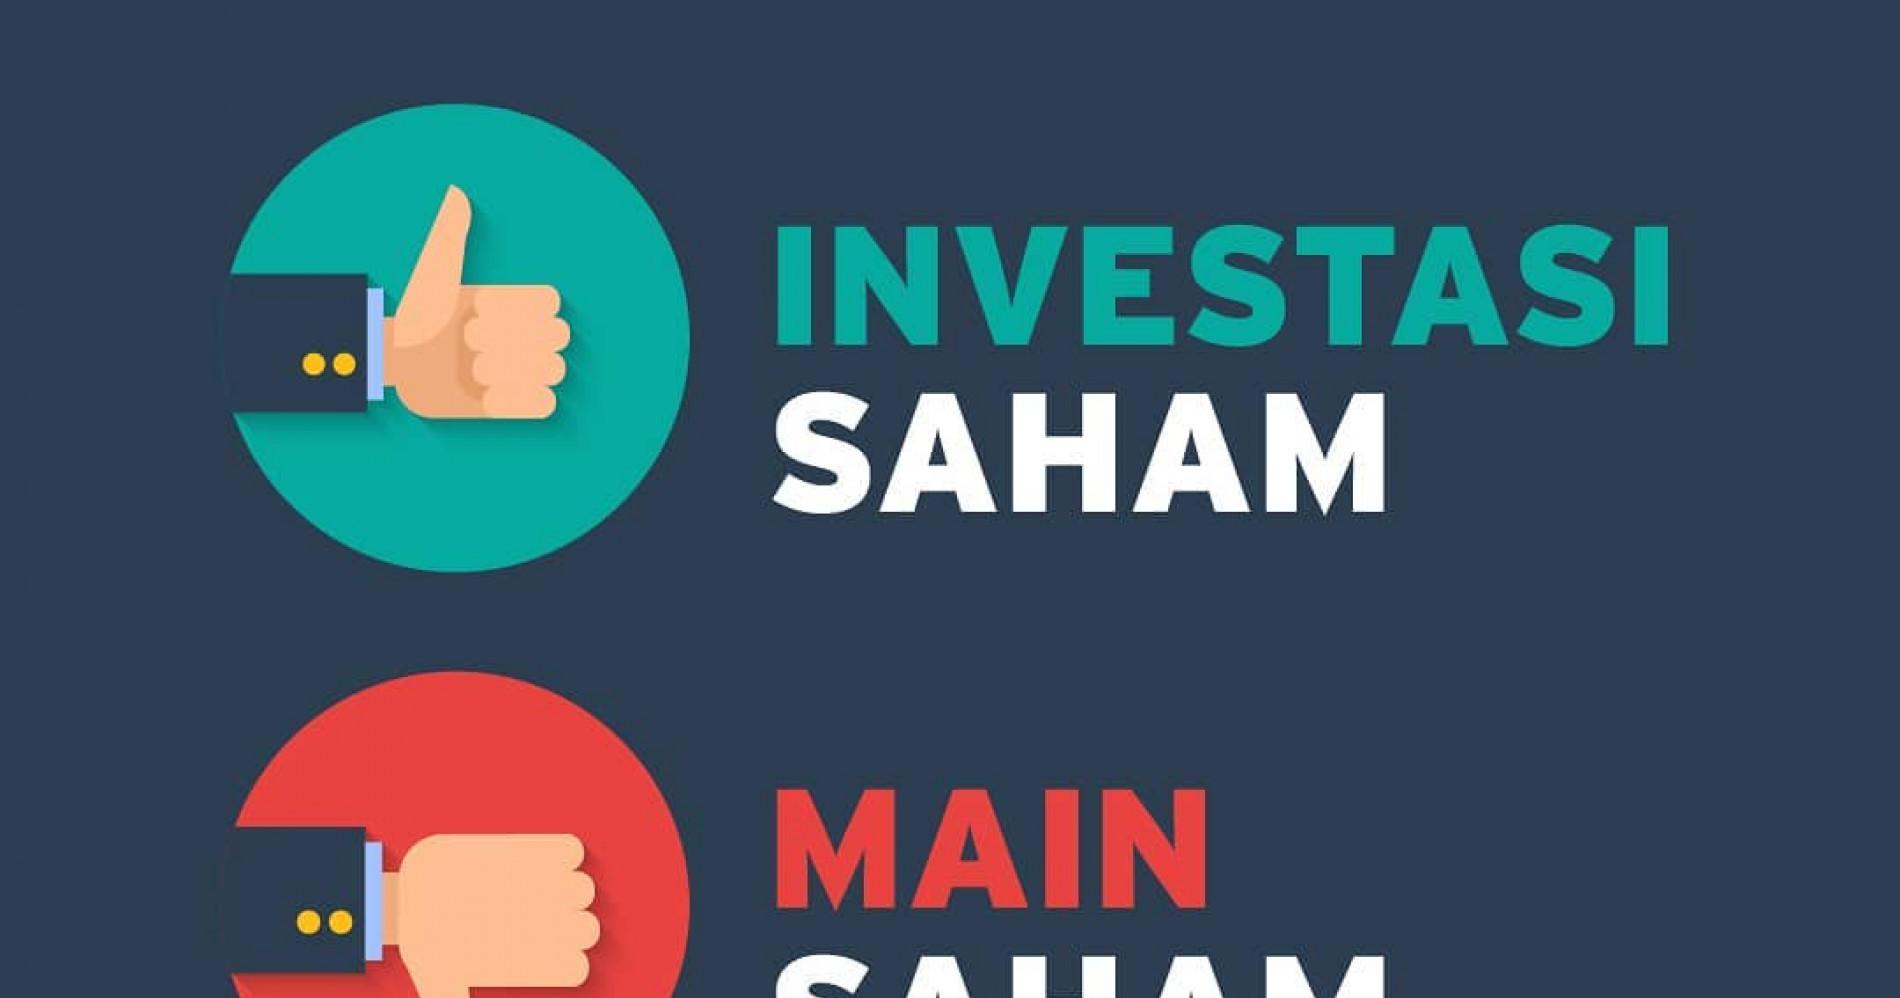 Investasi saham, bukan main saham. (Sumber gambar: https://www.instagram.com/p/CDL7G_QsTzY/?igshid=1ioltacqjjt6a)